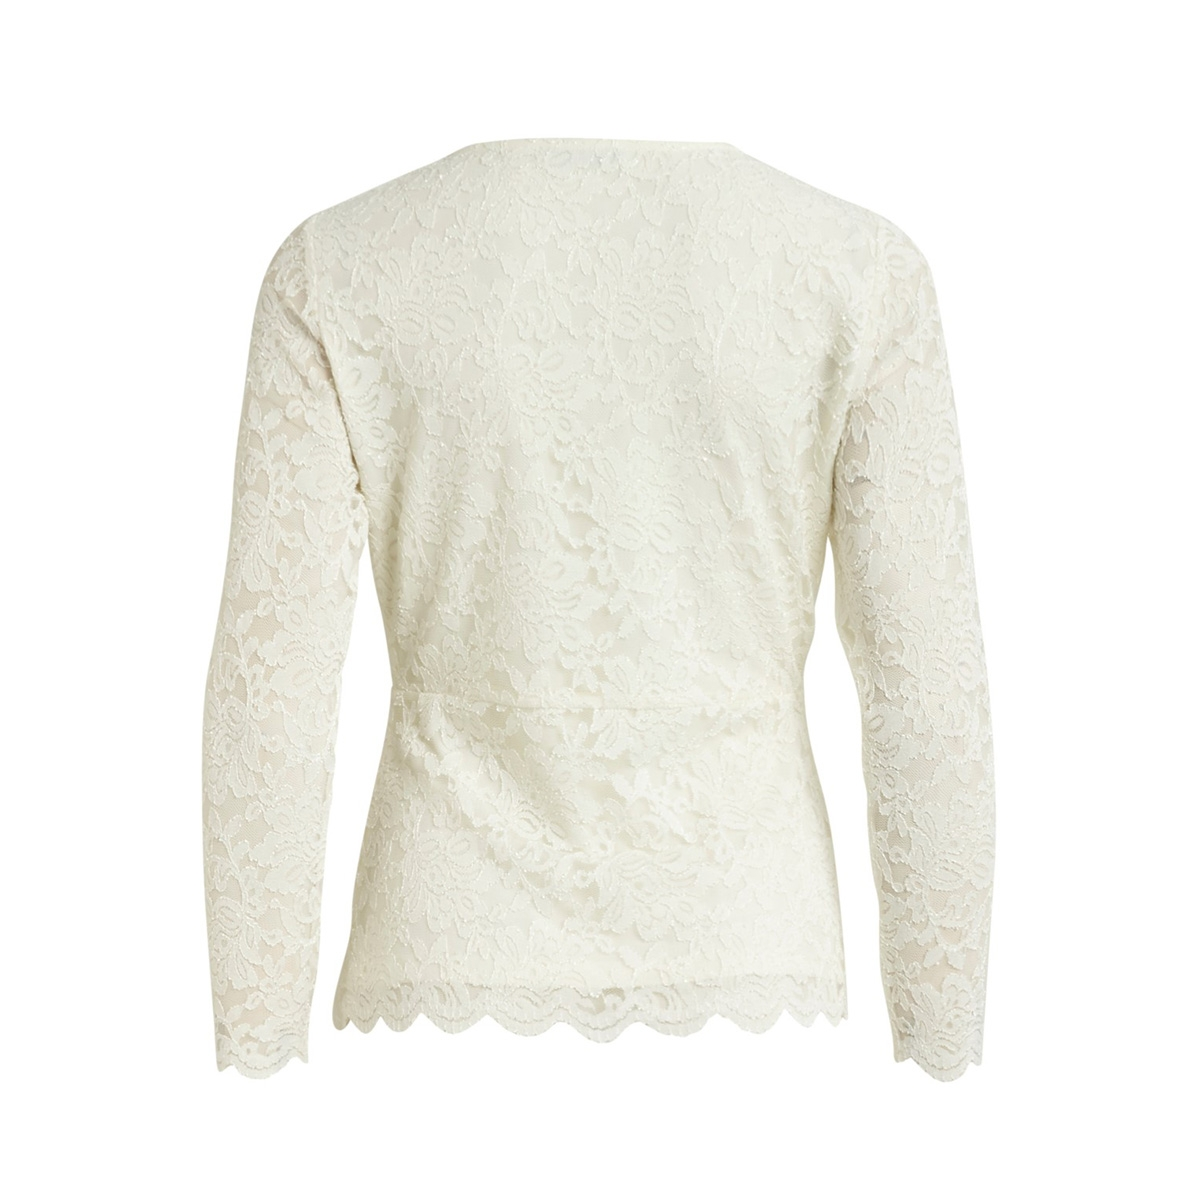 vikriva l/s sleeve top/l 14058842 vila vest cloud dancer